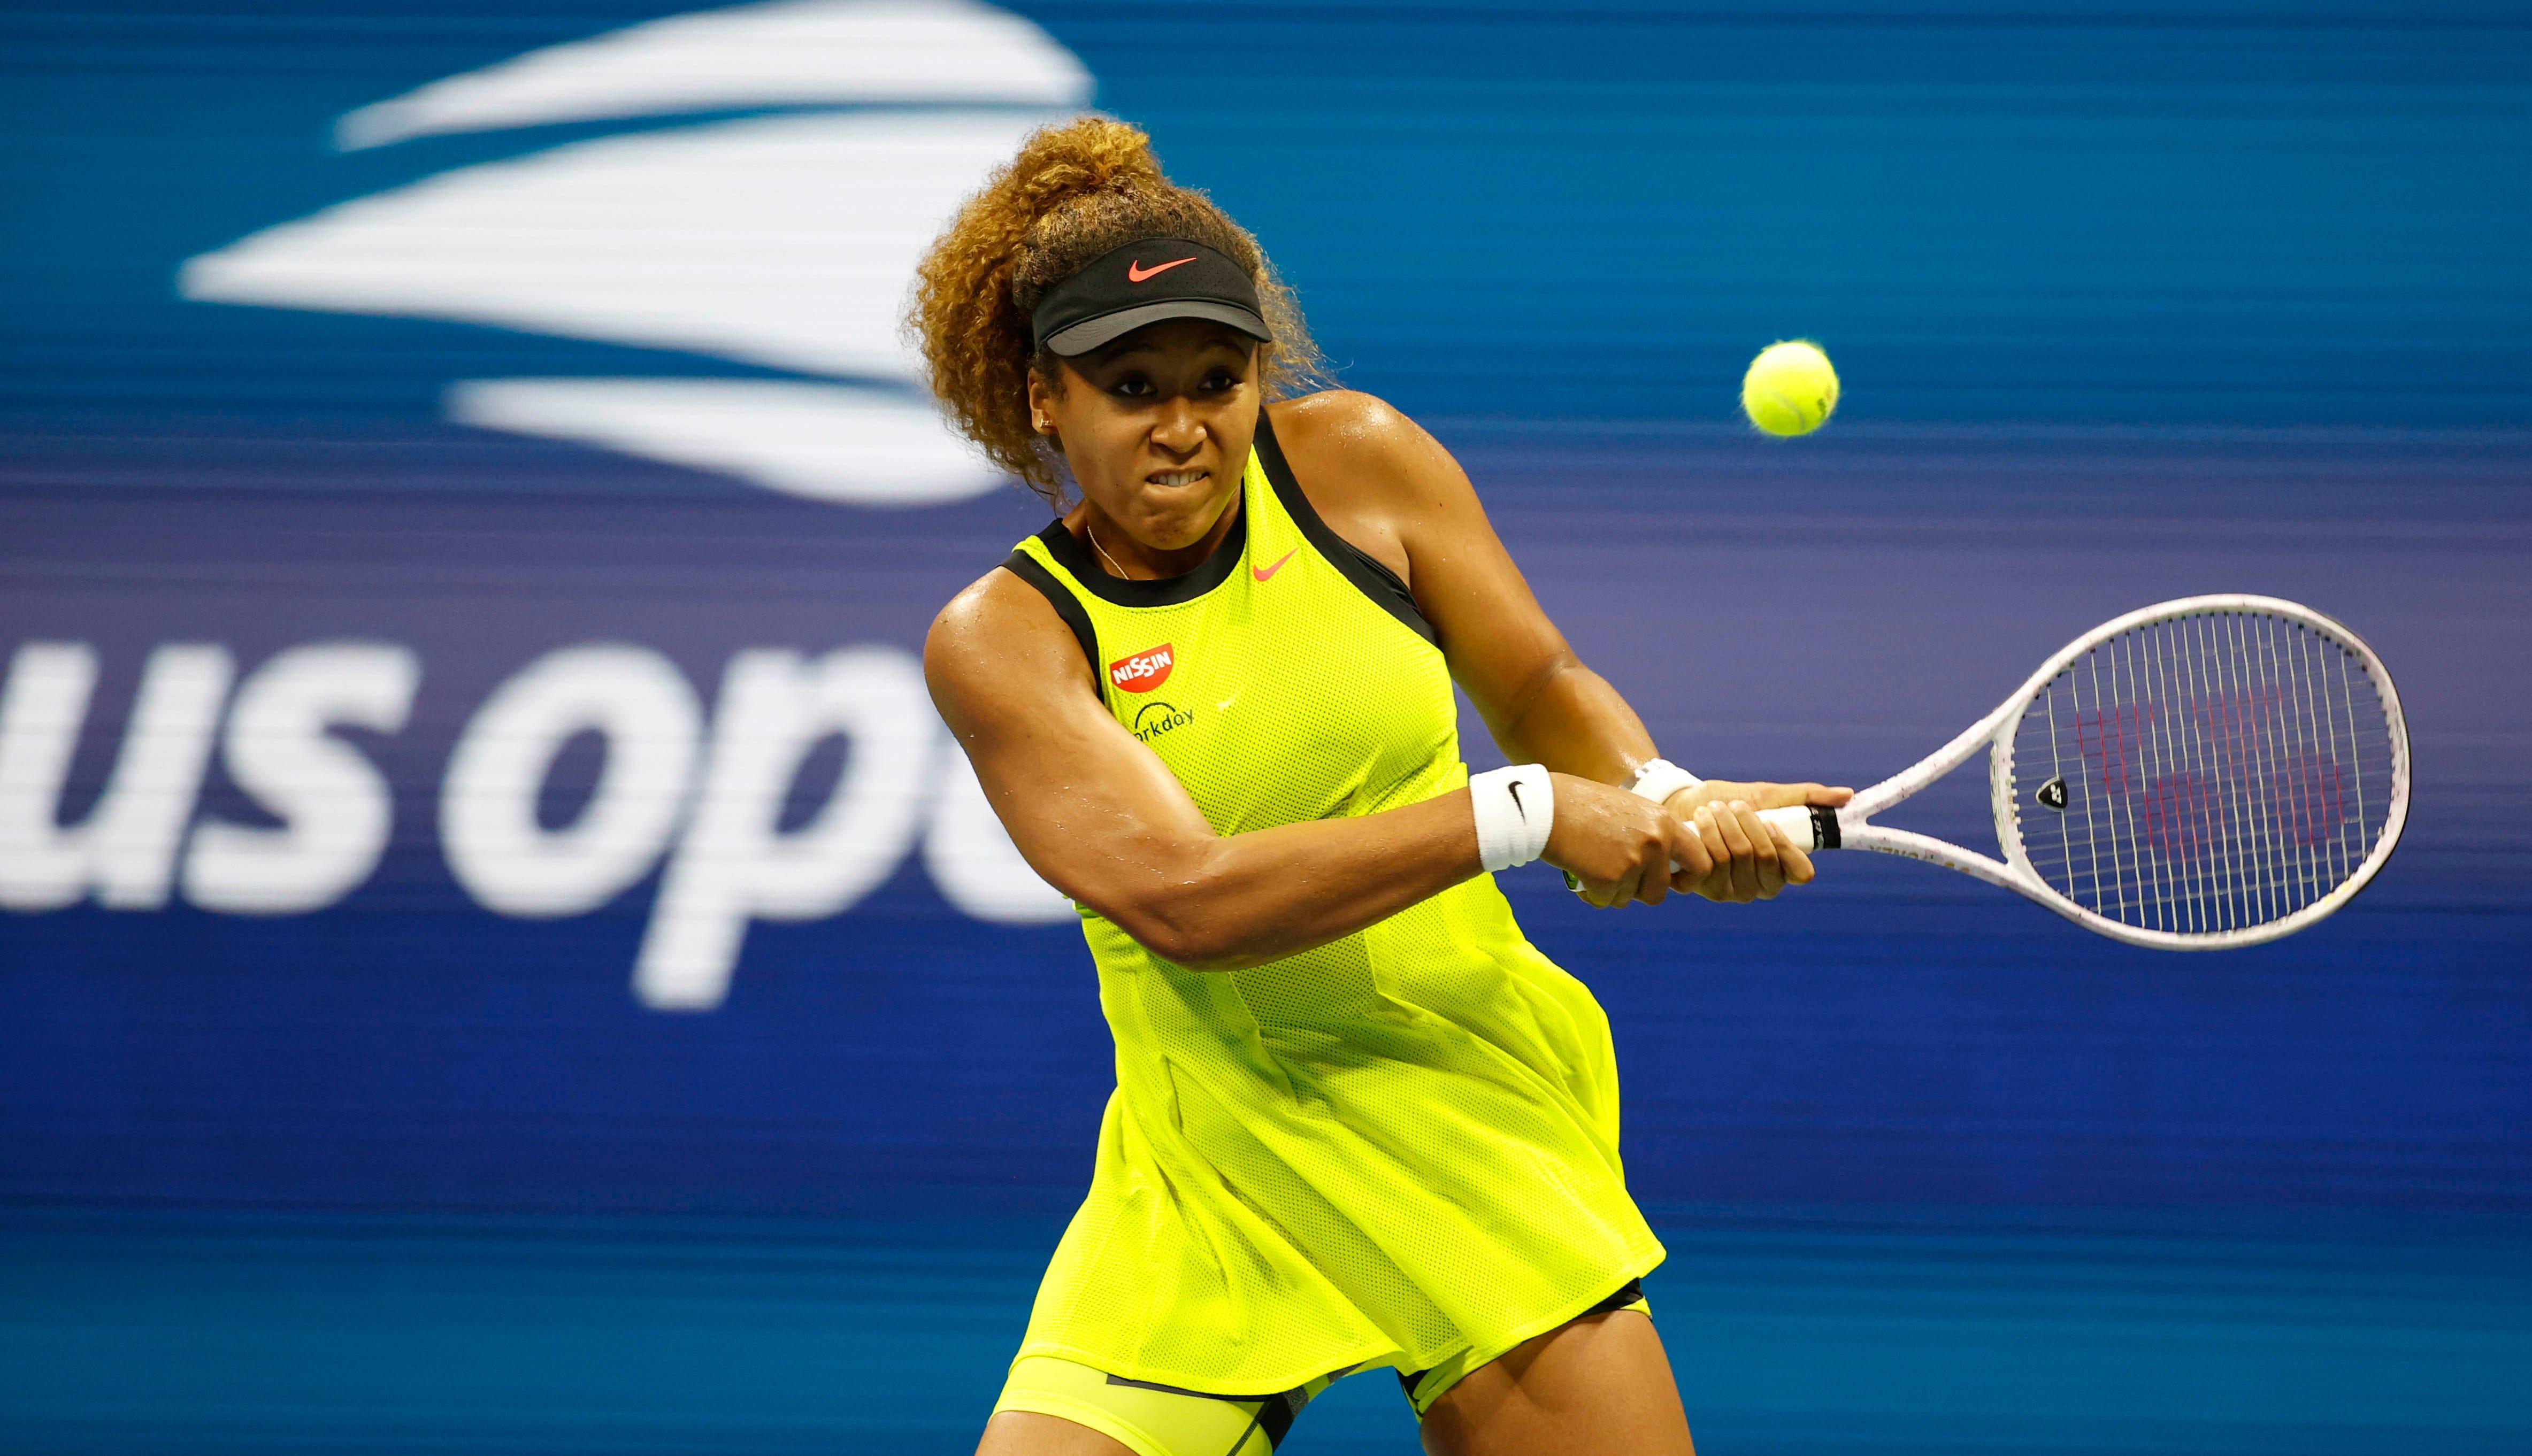 US Open 2021: Naomi Osaka vs. Olga Danilovic Tennis Pick and Prediction